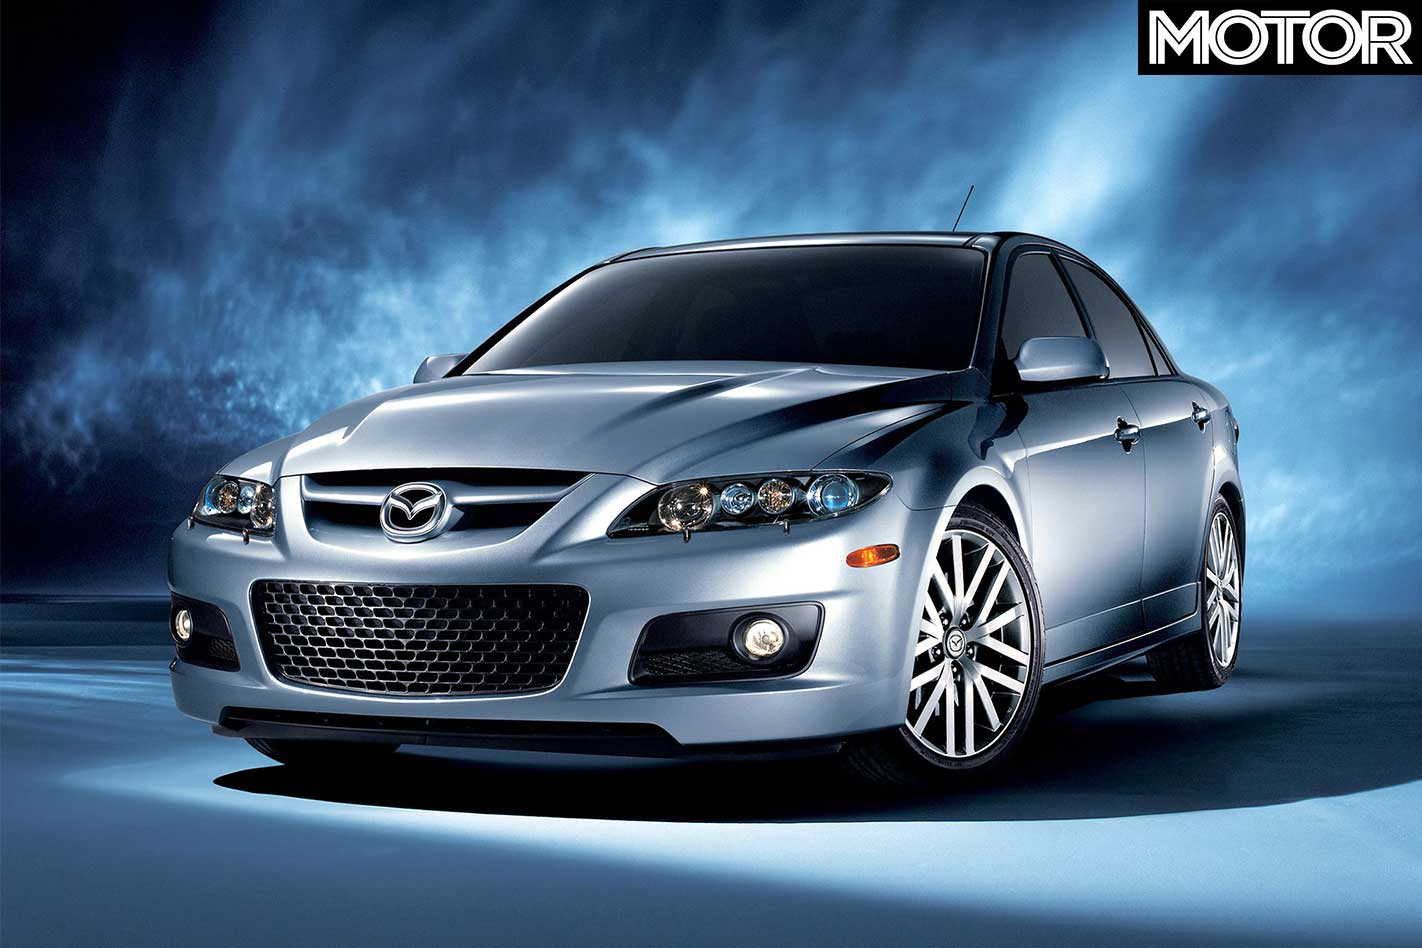 2005 Mazda6 MPS. DRIVE: All Wheel